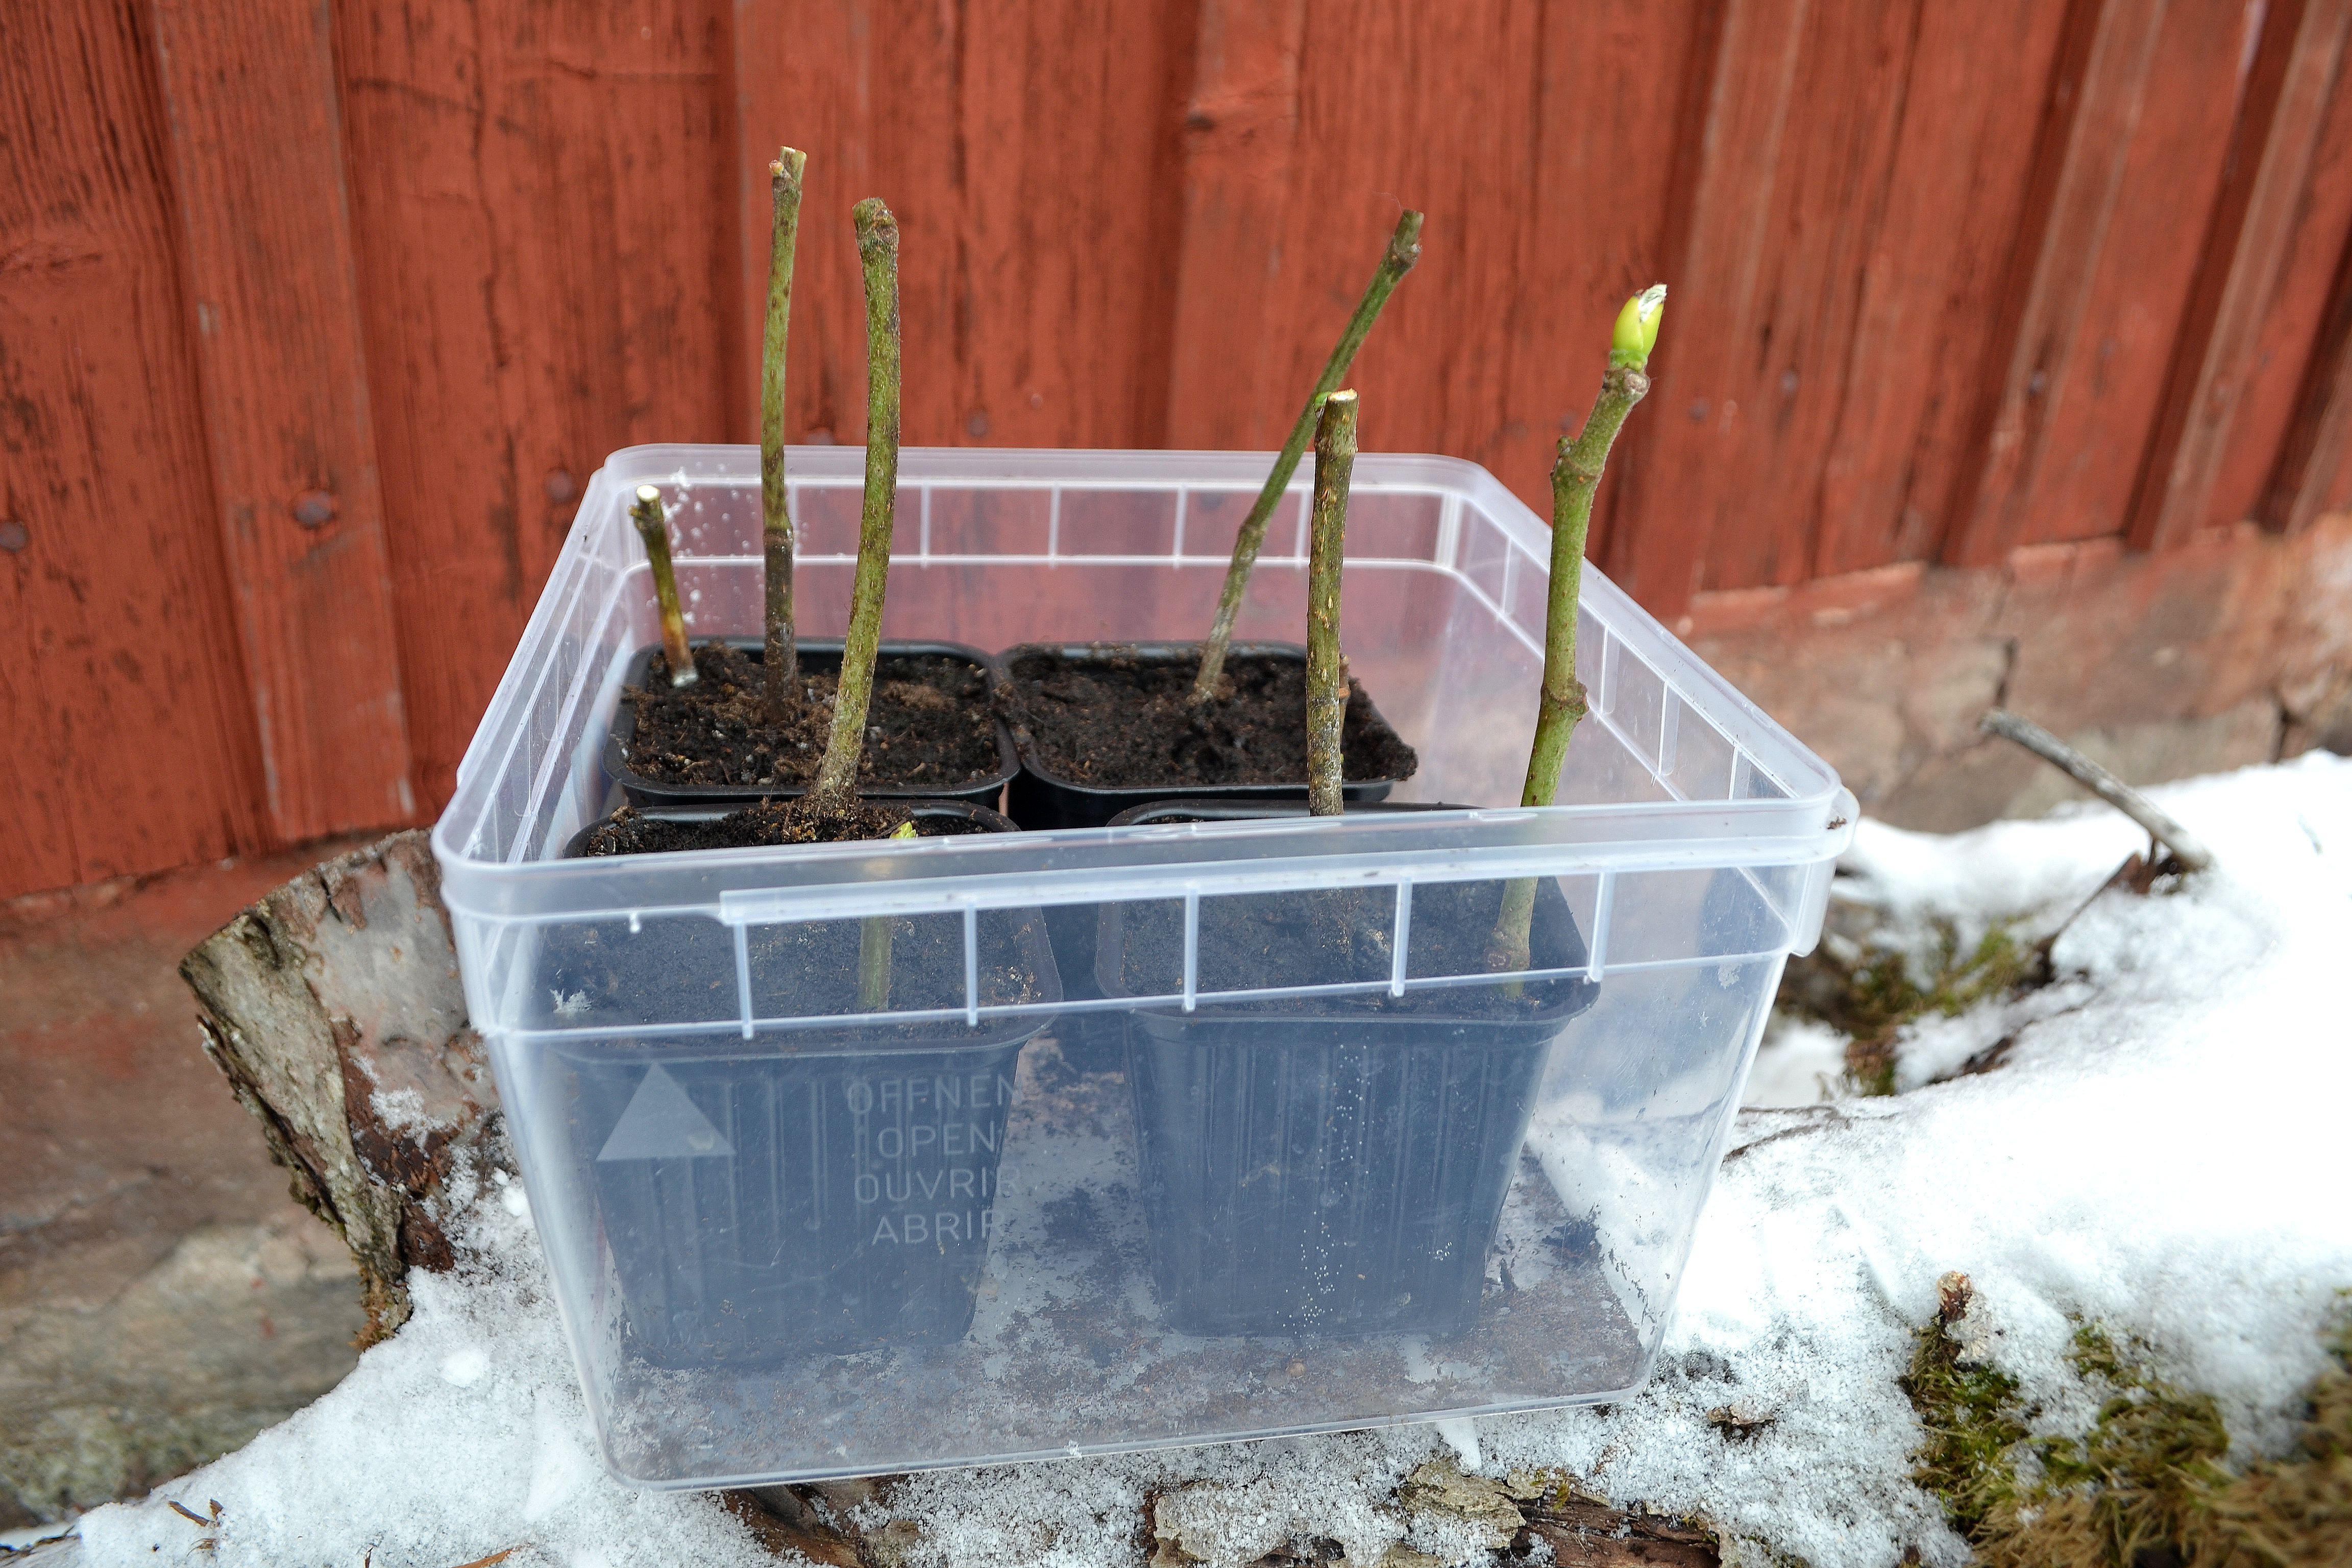 En genomskinlig låda med fyra krukor med kala pinnar i jord. Propagating figs, a see-through box with four pots.